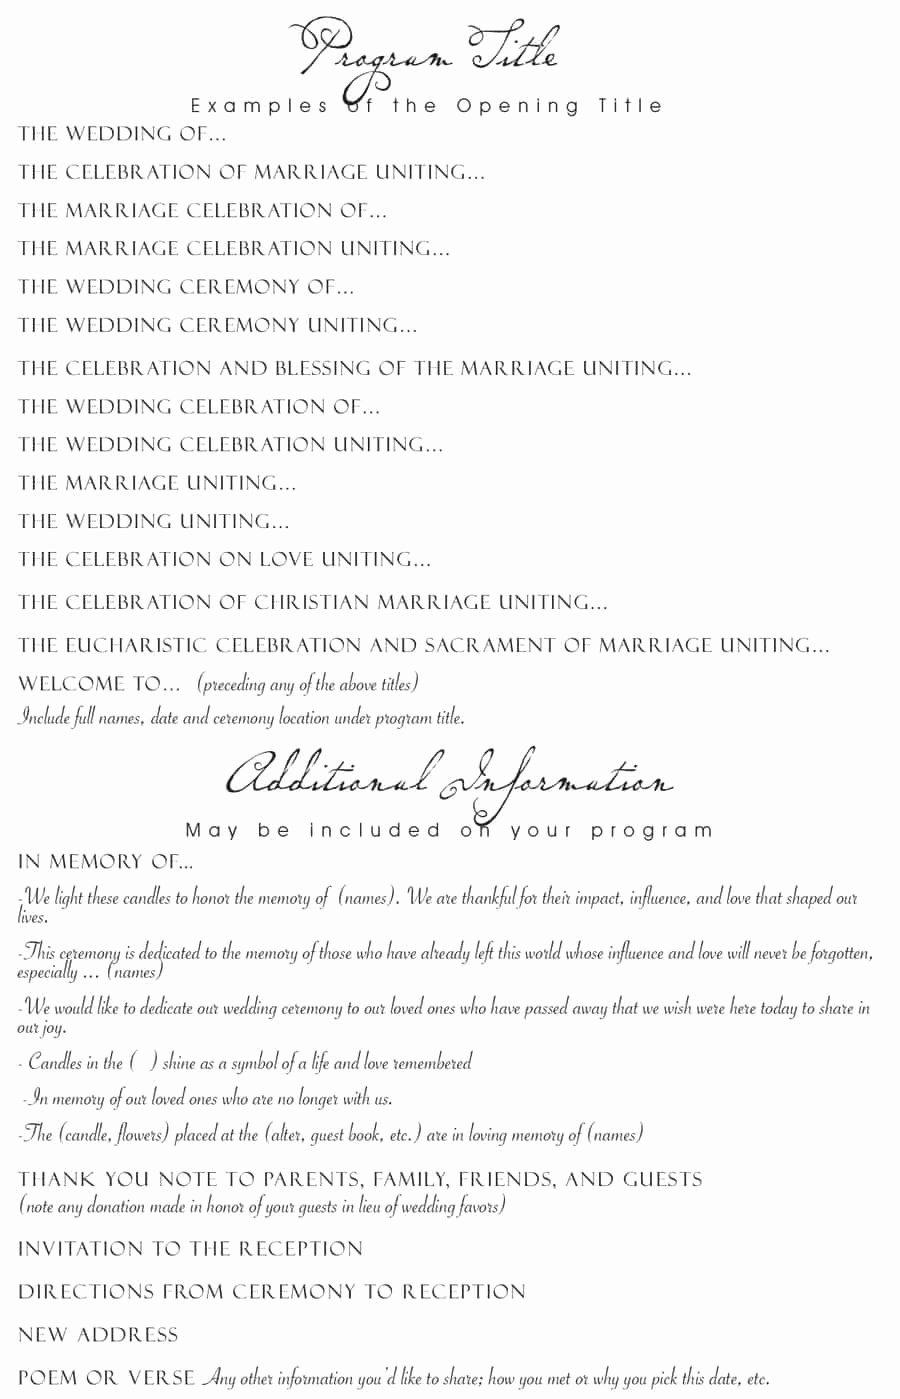 Sample Of Wedding Programme Lovely 37 Printable Wedding Program Examples & Templates